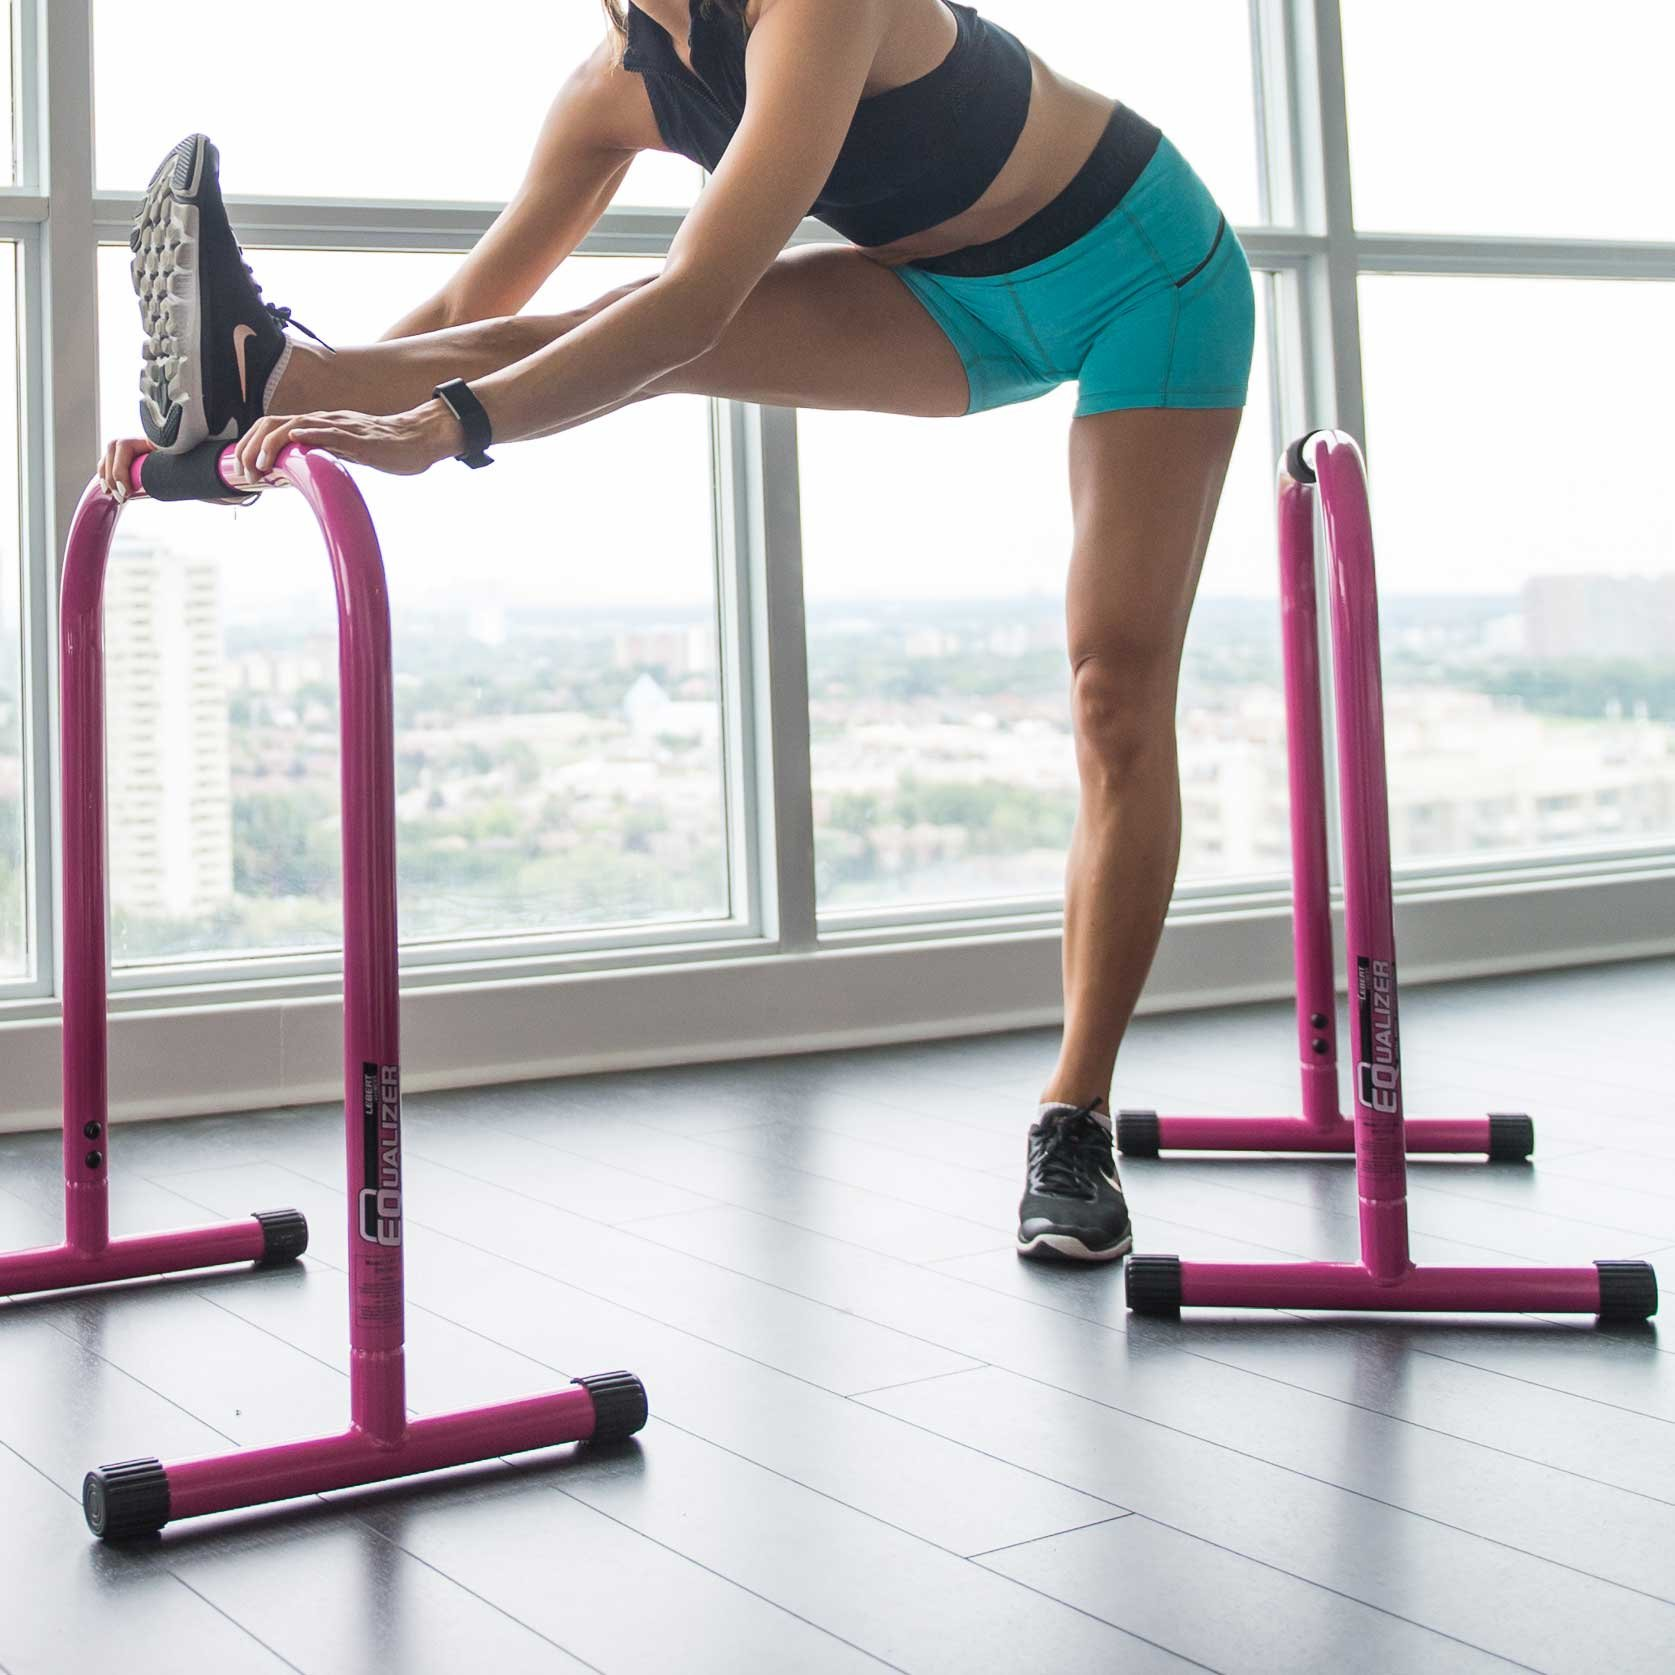 Lebert Fitness Equalizer Bars Total Body Strengthener, Pink by Lebert (Image #2)